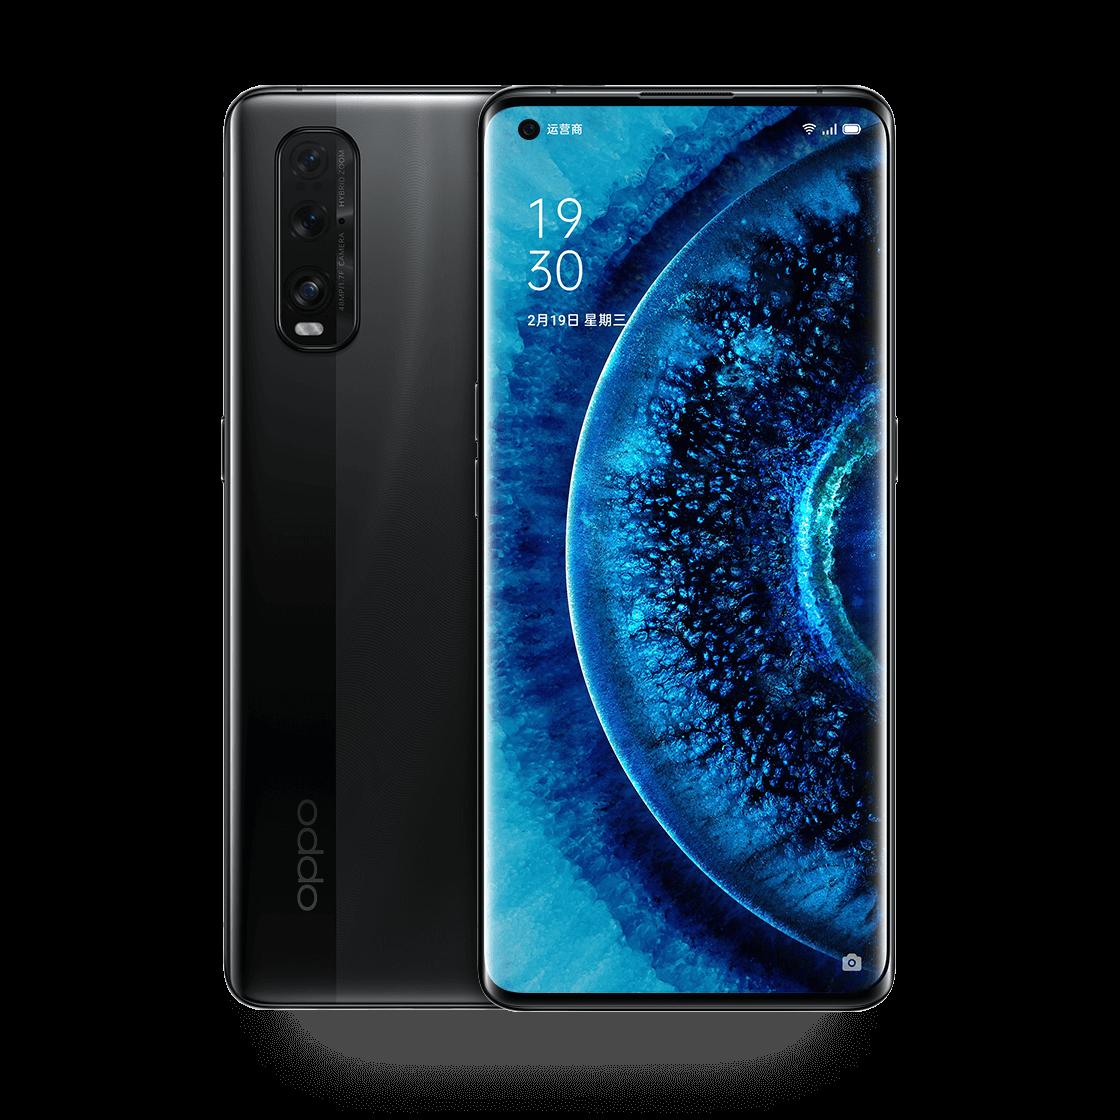 OPPO Find X2系列5G智能手机发布 DXO评分第一最高24期免息